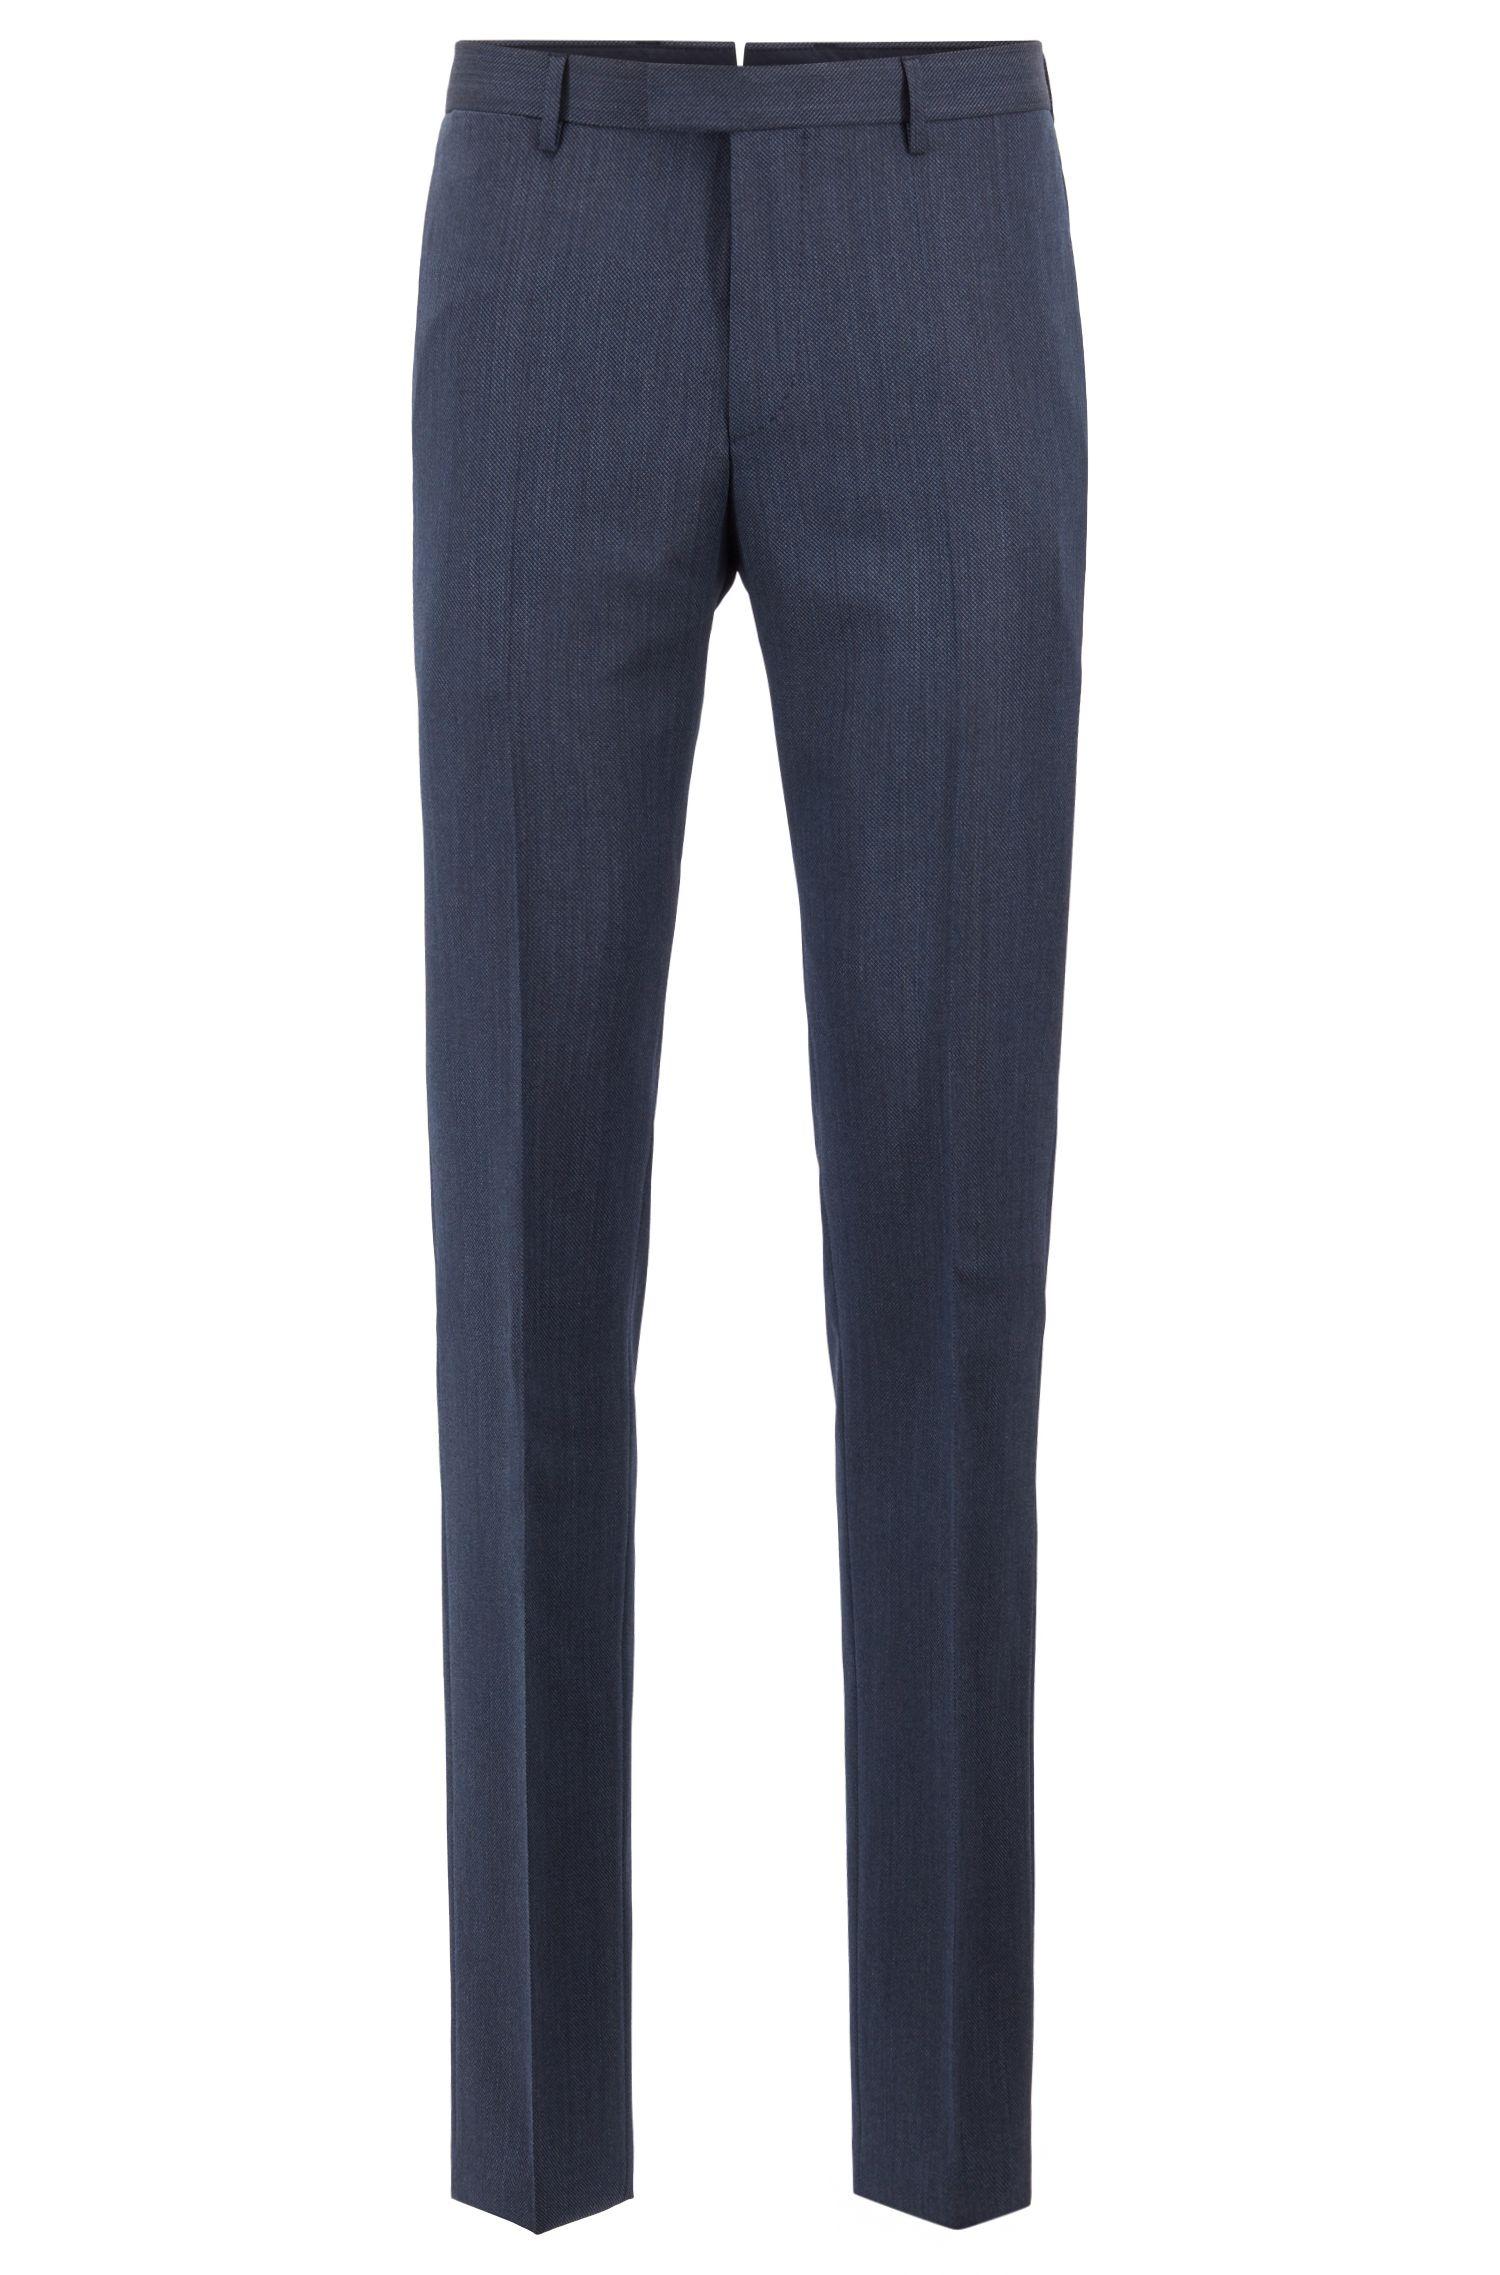 Tailored slim-fit trousers in melange virgin wool, Open Blue